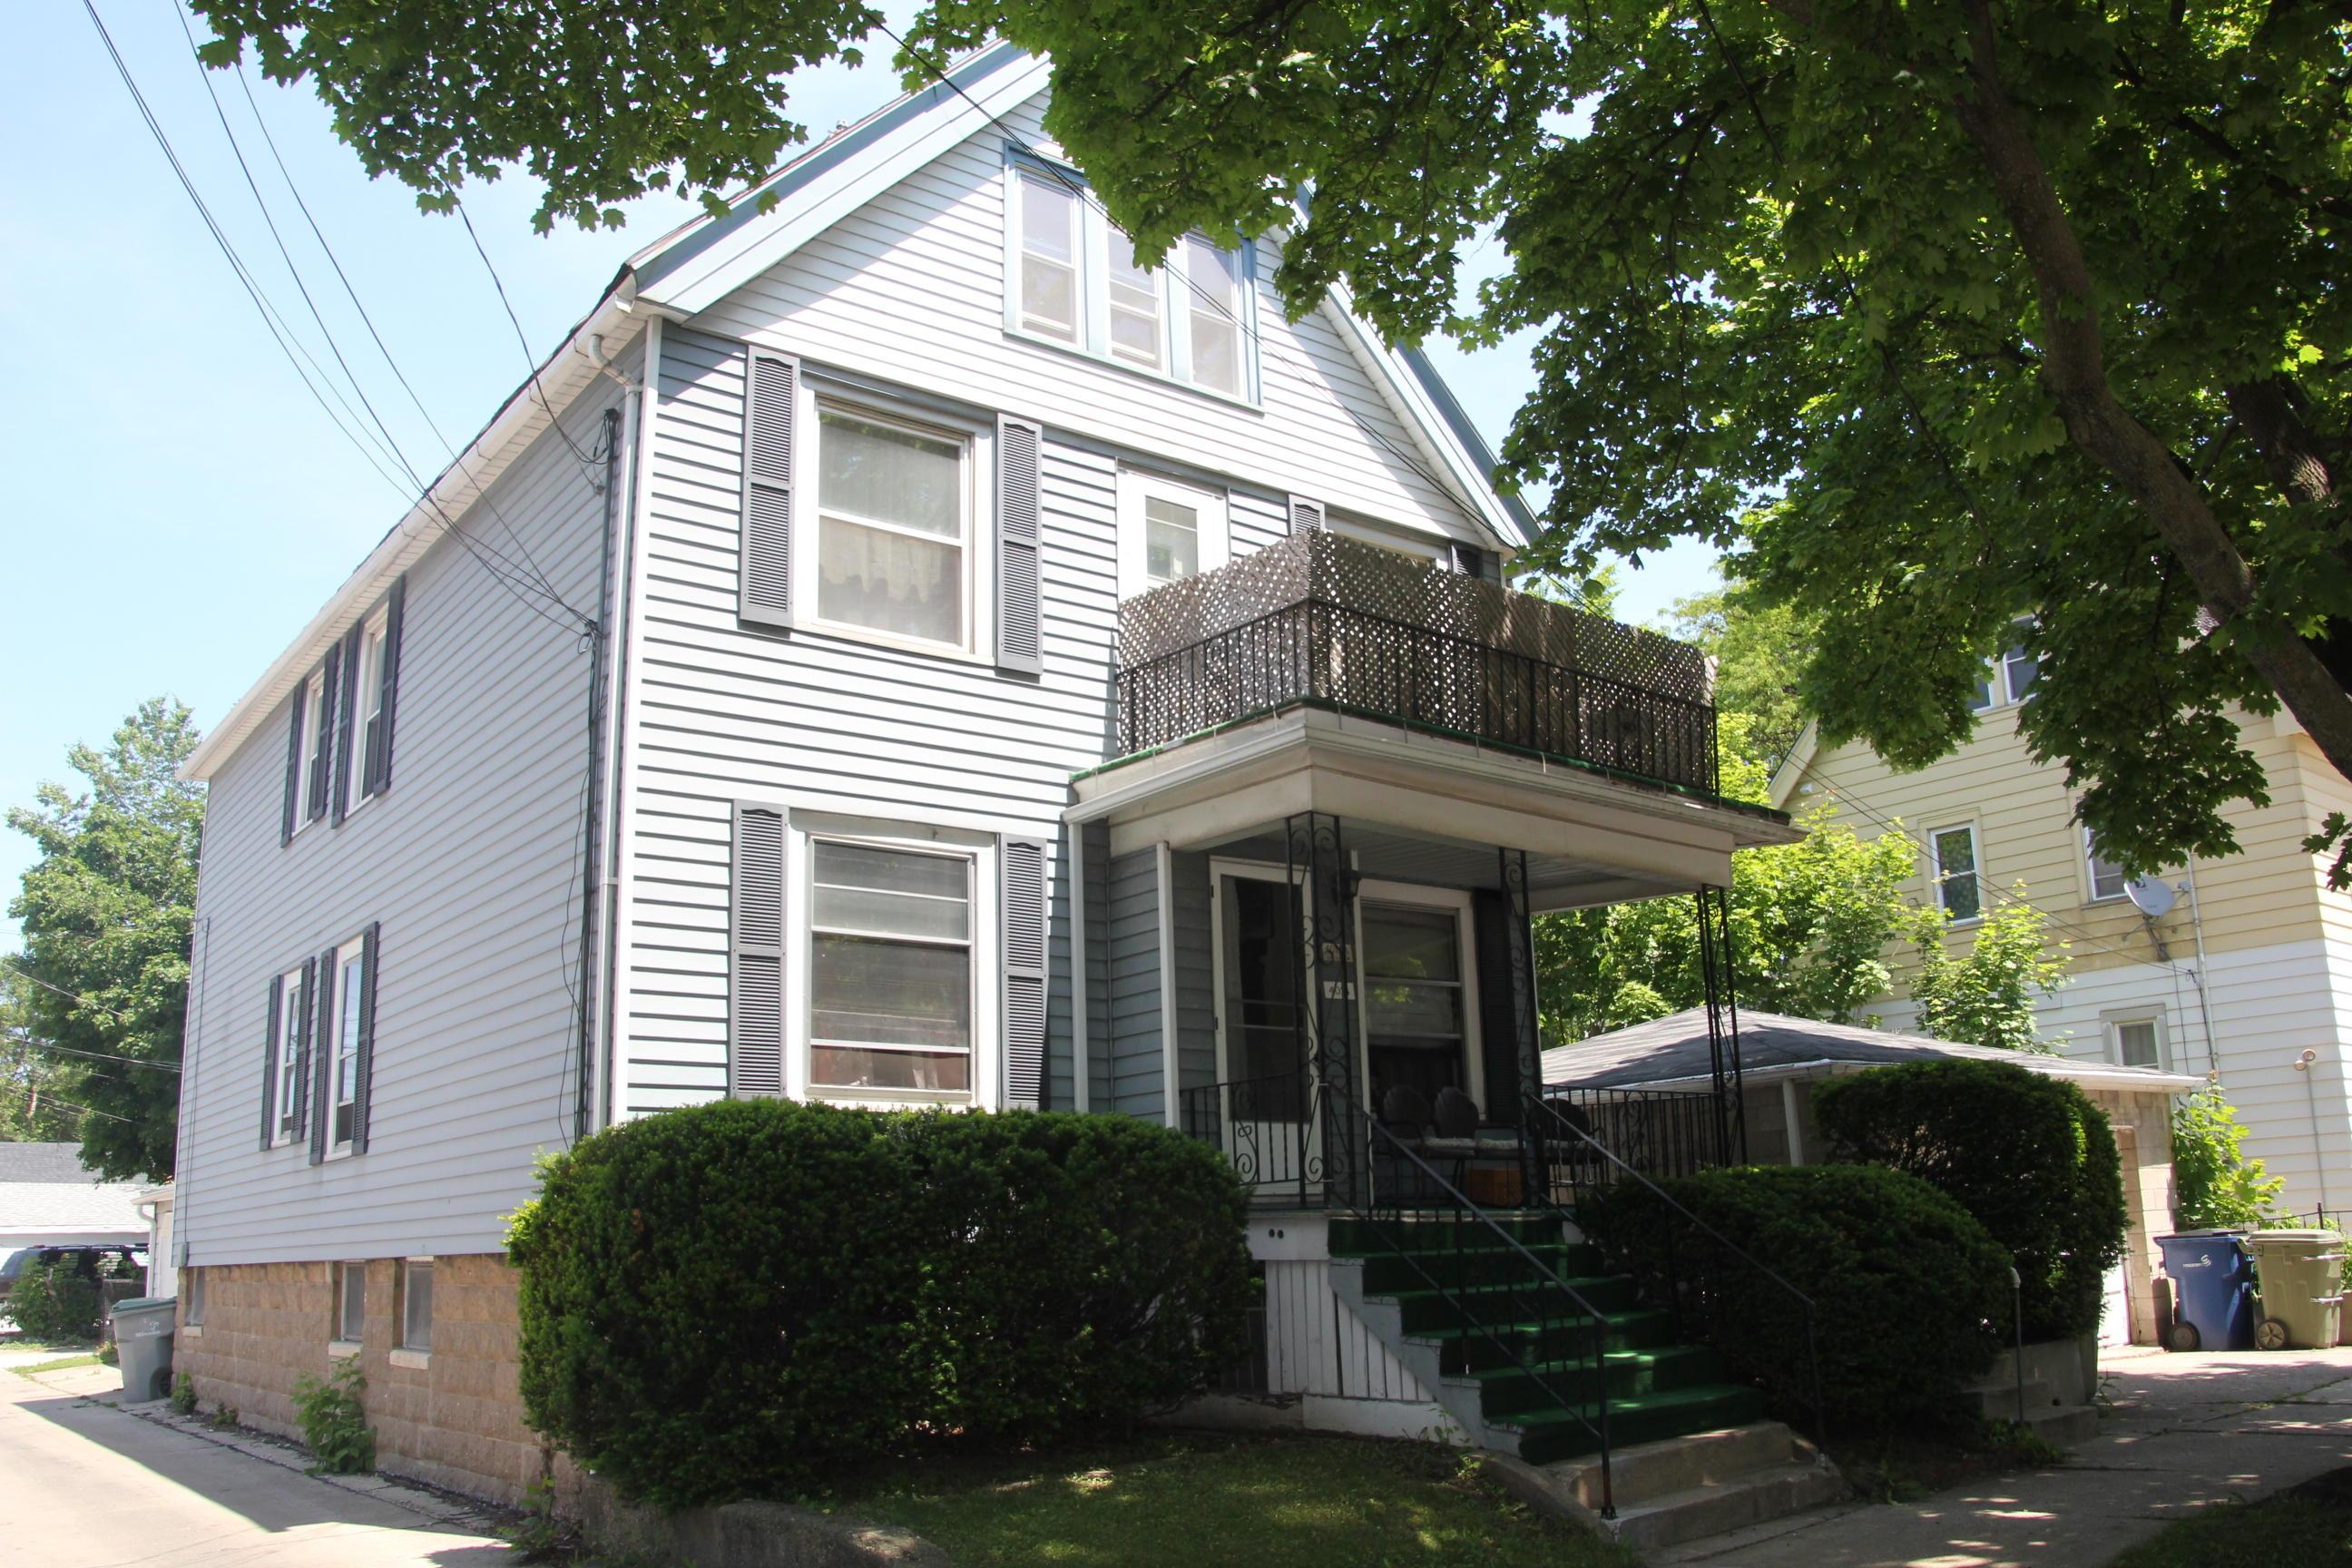 4014 W. St Paul Ave